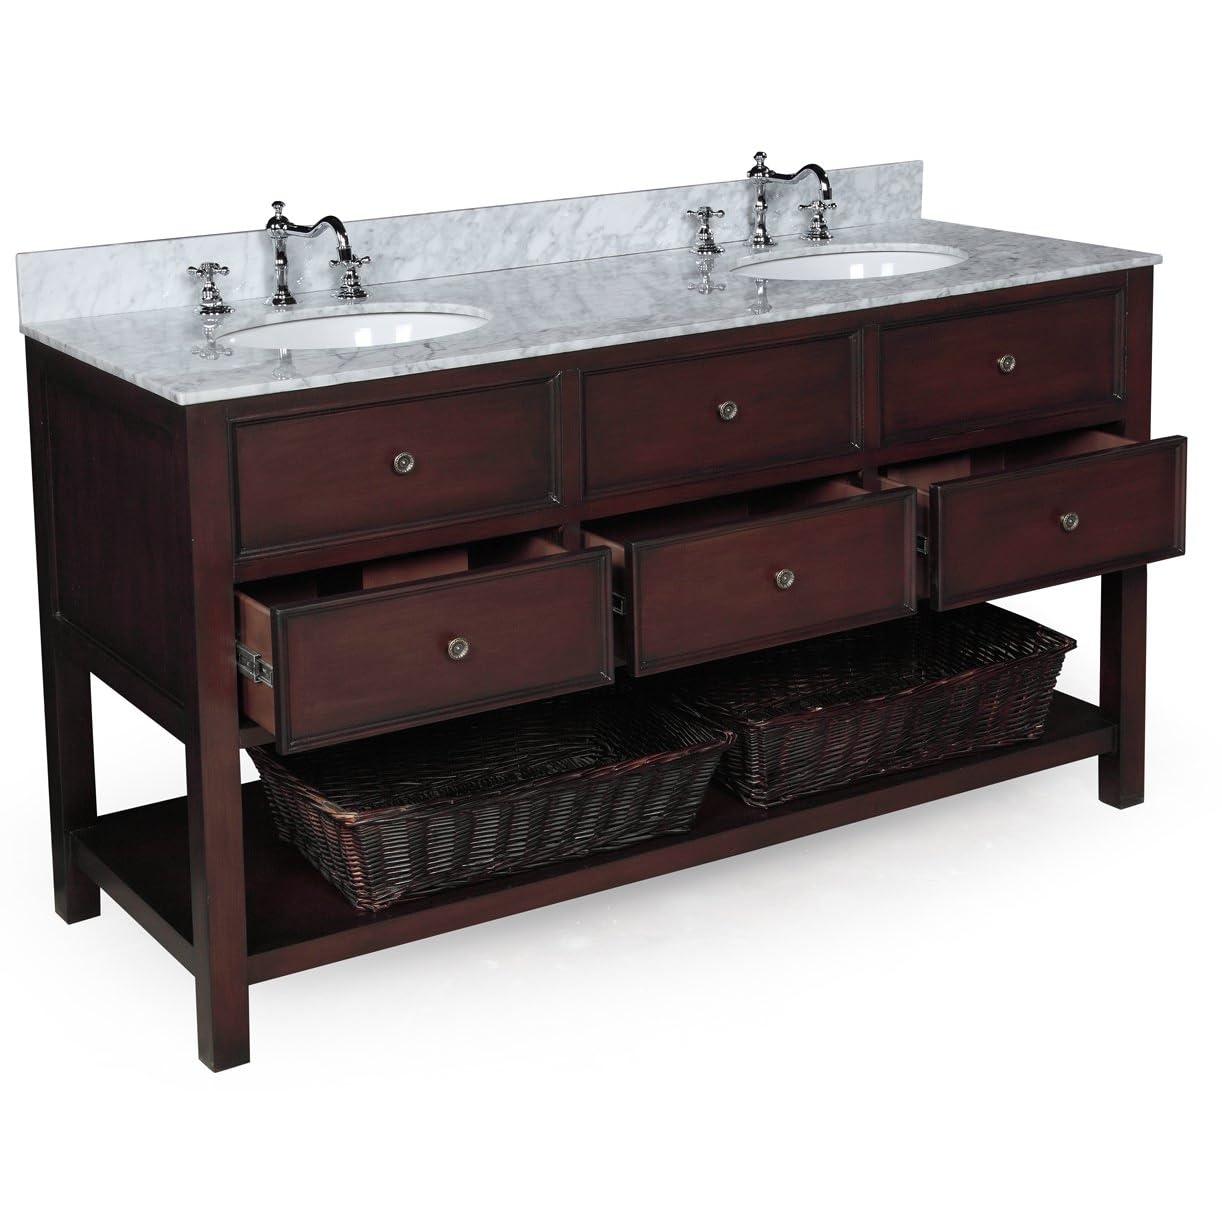 Beautiful Pottery Barn Bathroom Vanities Beautiful Addition To Your Bathroom